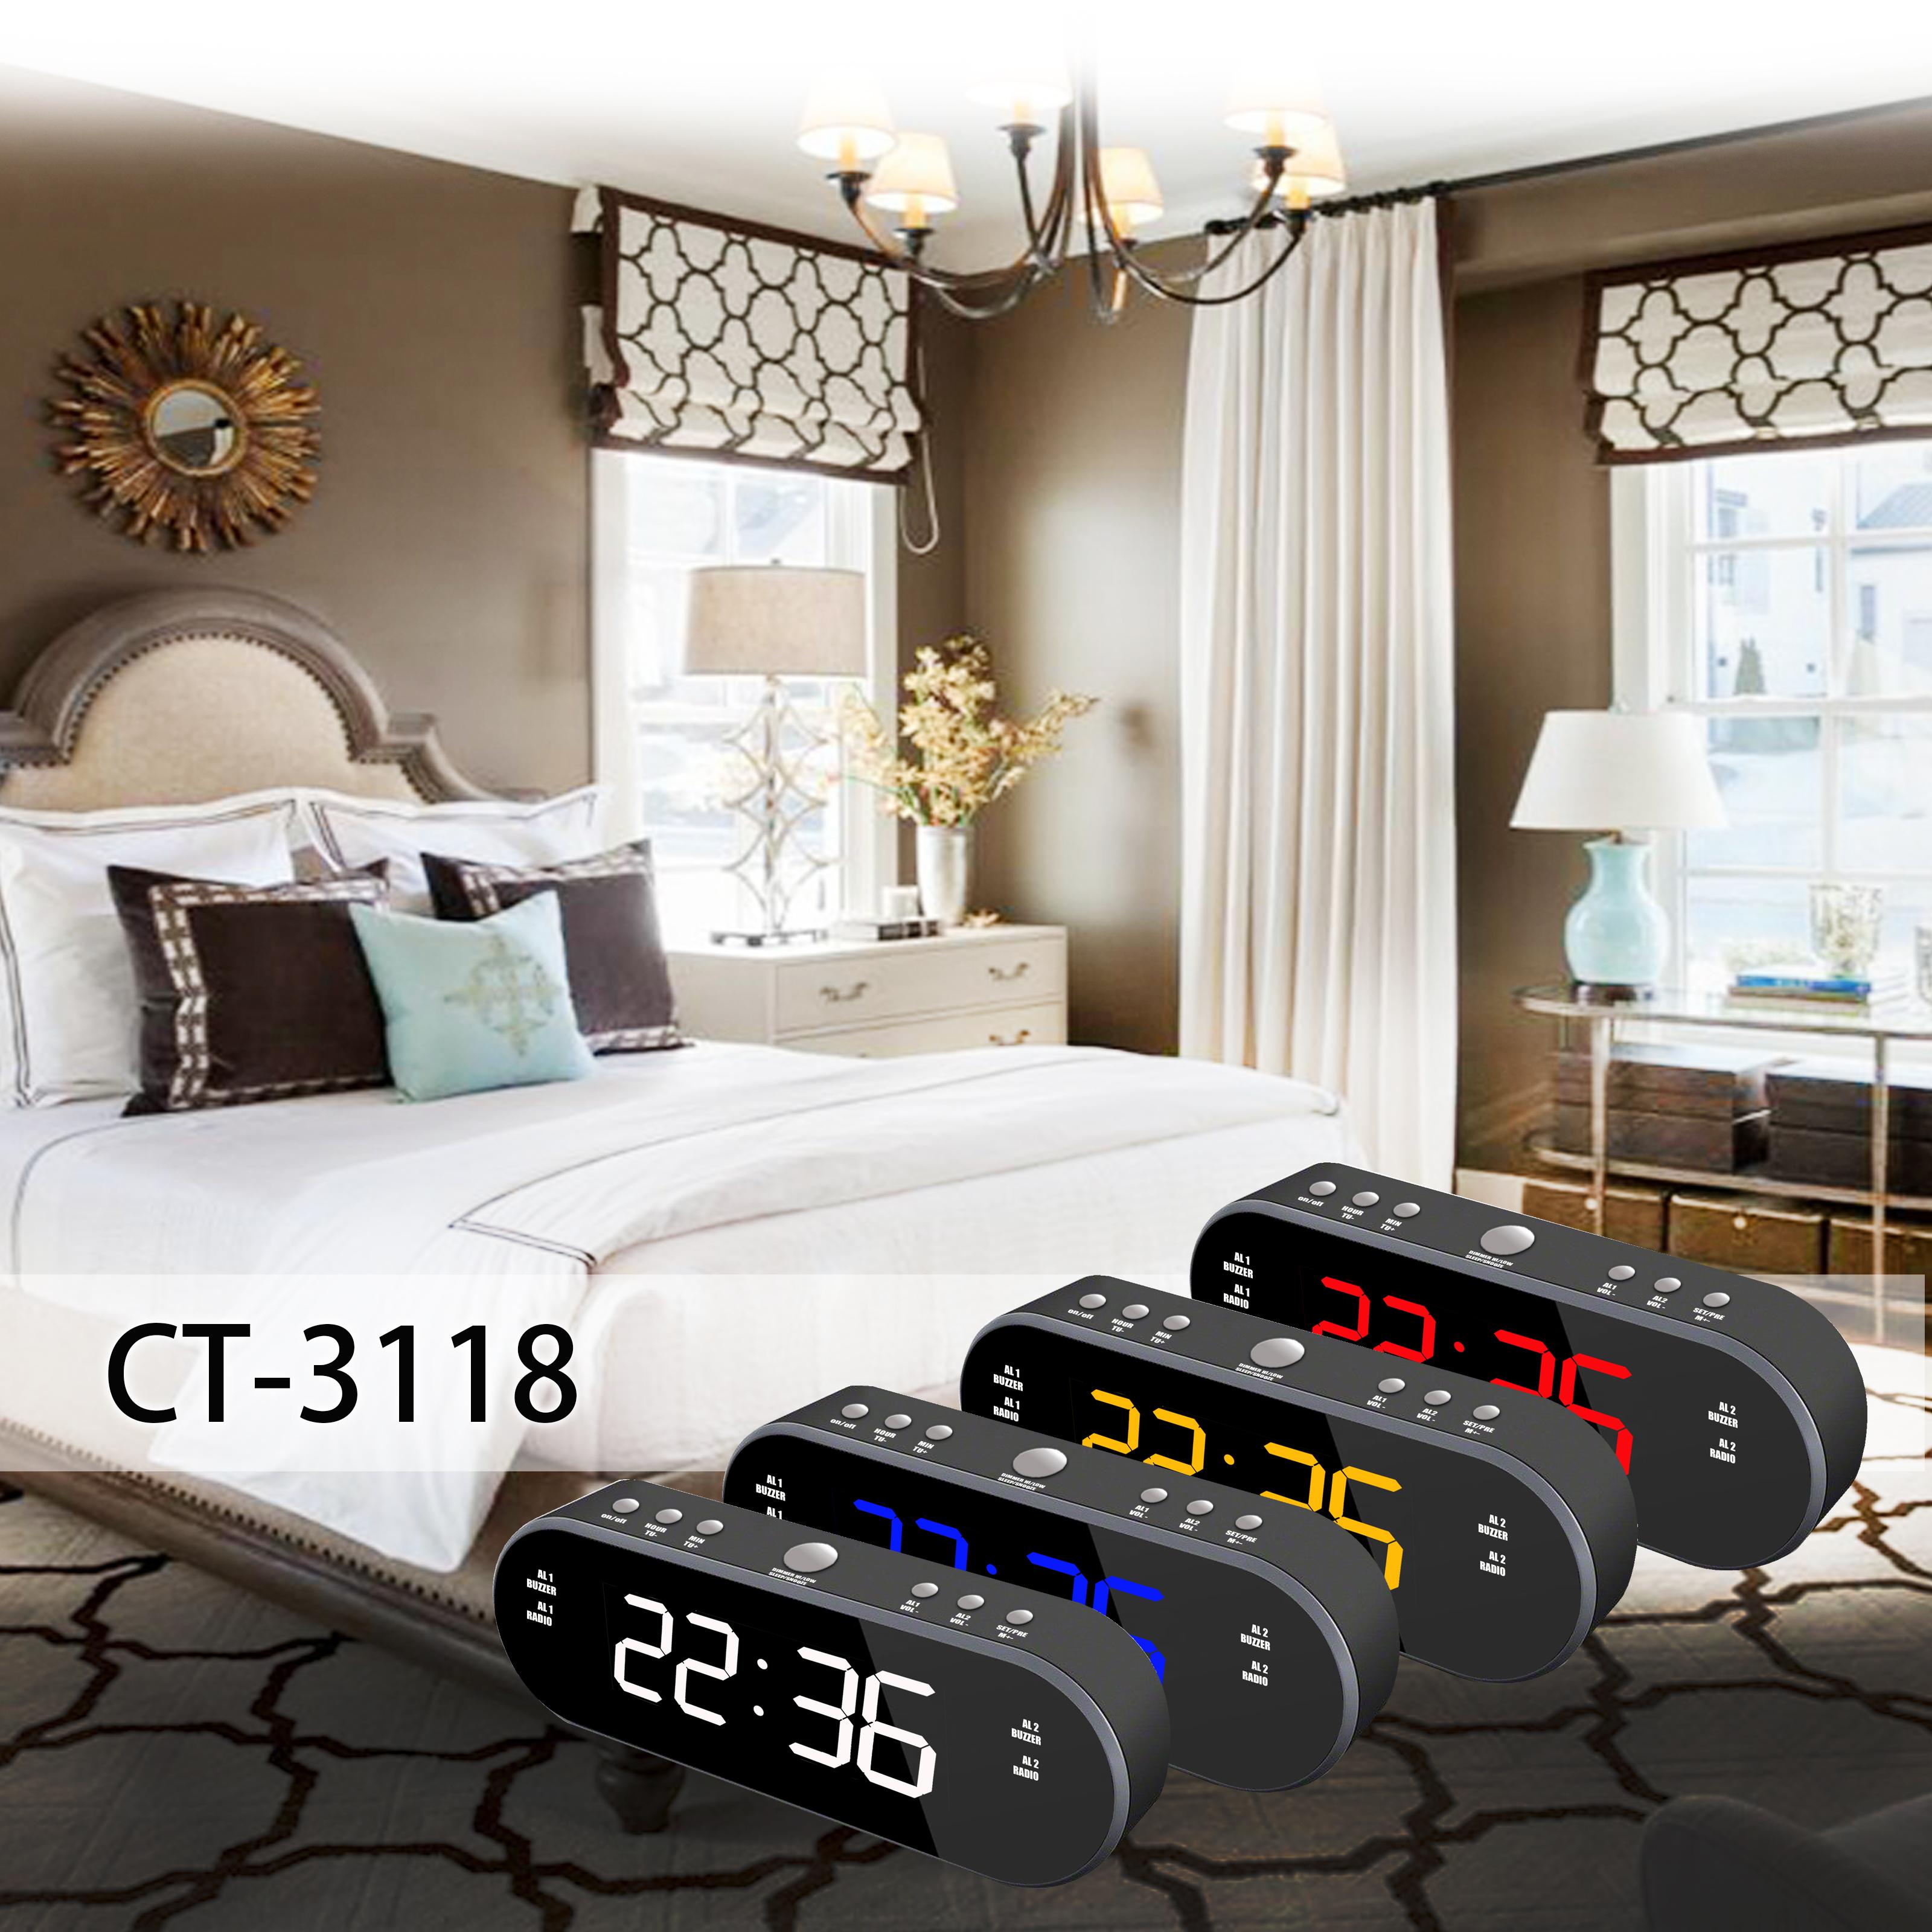 CT-3118